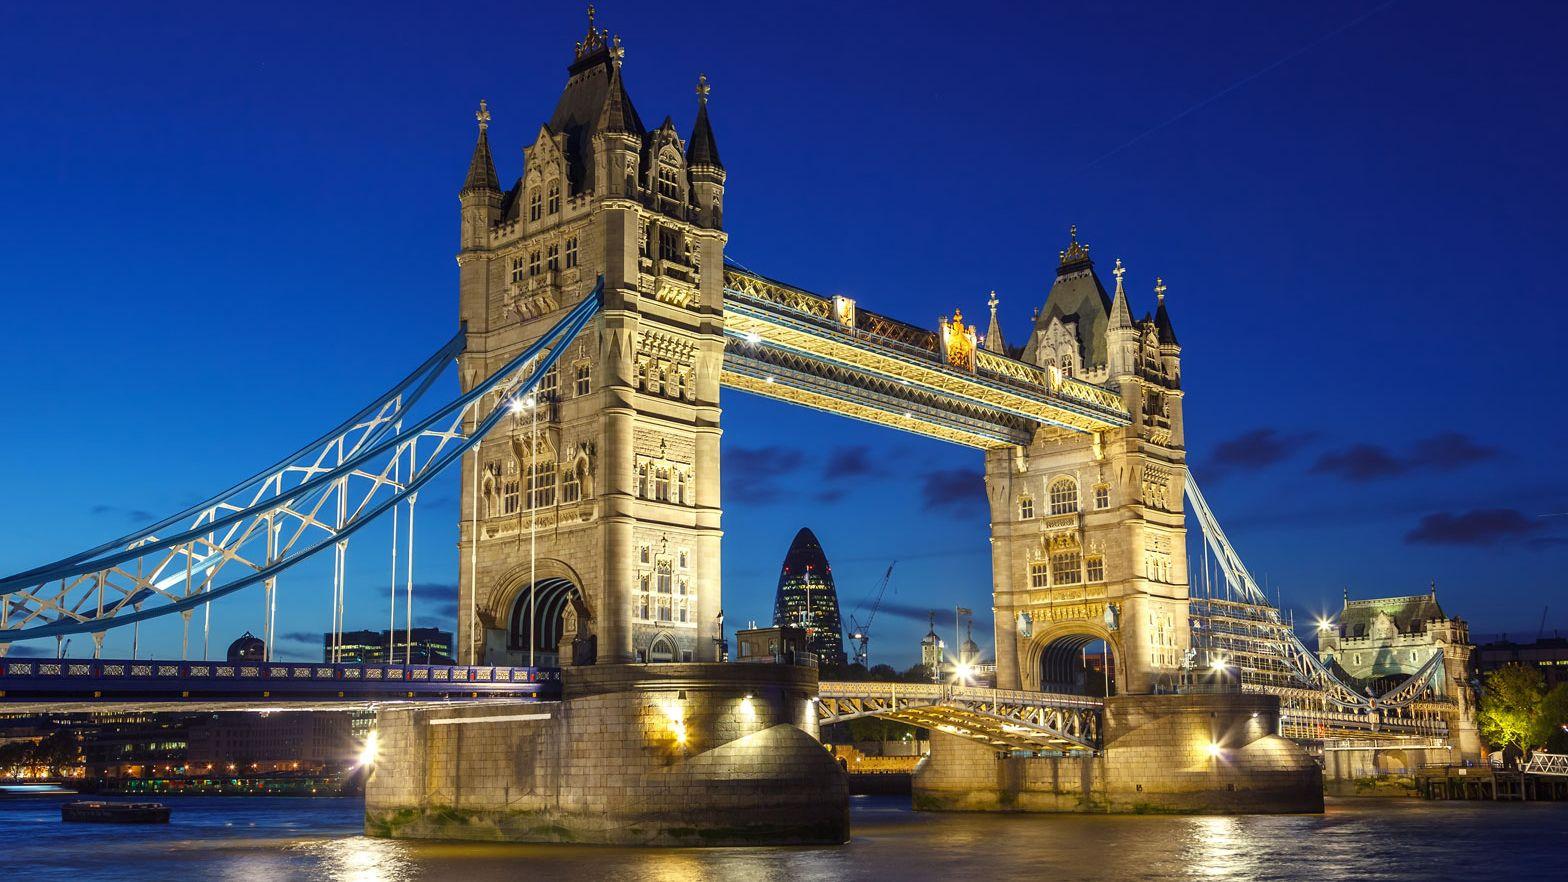 Stock image of the London bridge lit up at night